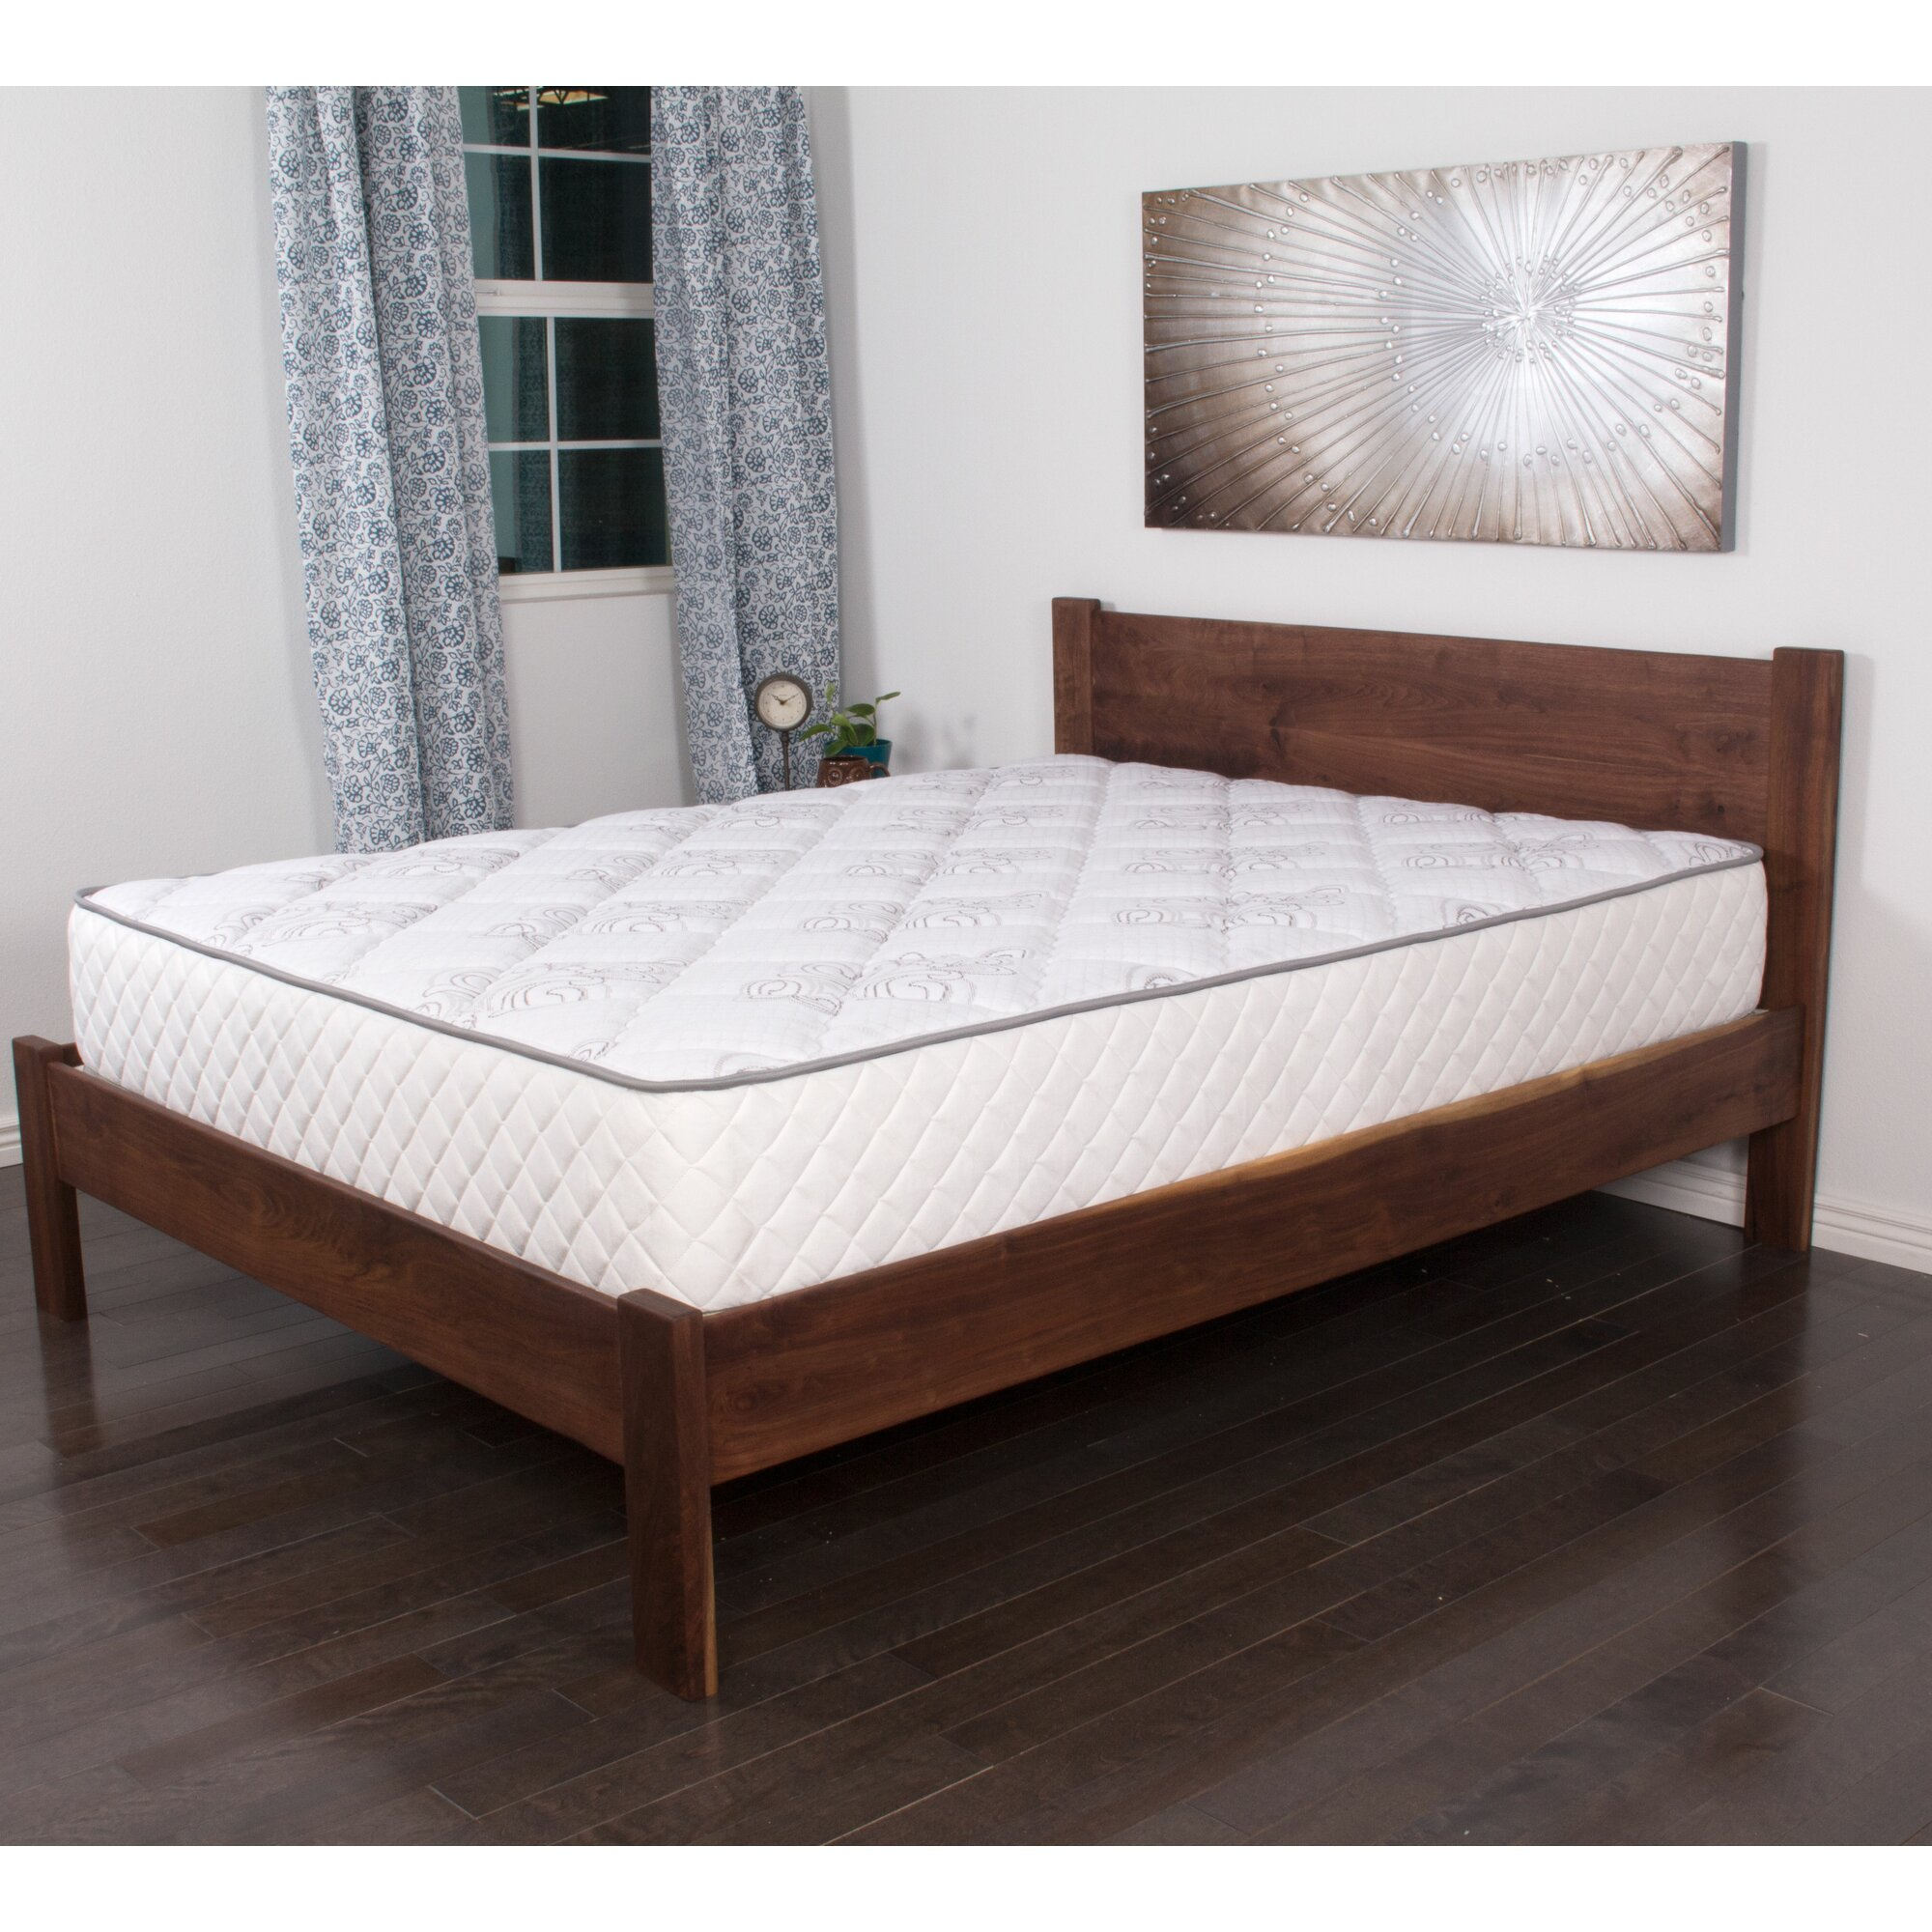 wayfair sleep wayfair sleep 10 firm innerspring mattress reviews. Black Bedroom Furniture Sets. Home Design Ideas